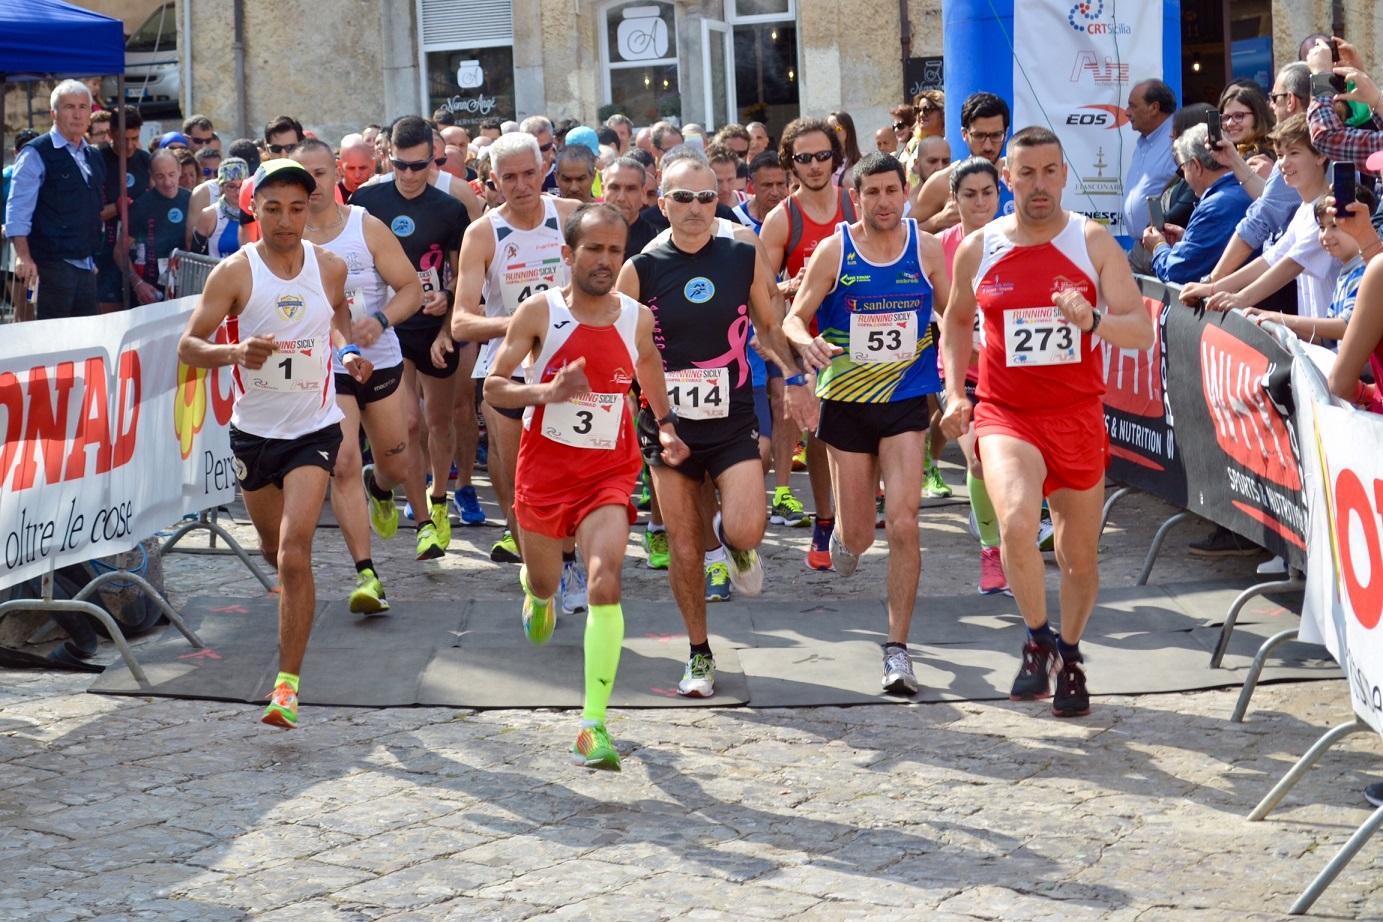 Running Sicily-Coppa Conad, fervono i preparativi per la Palermo International Half Marathon